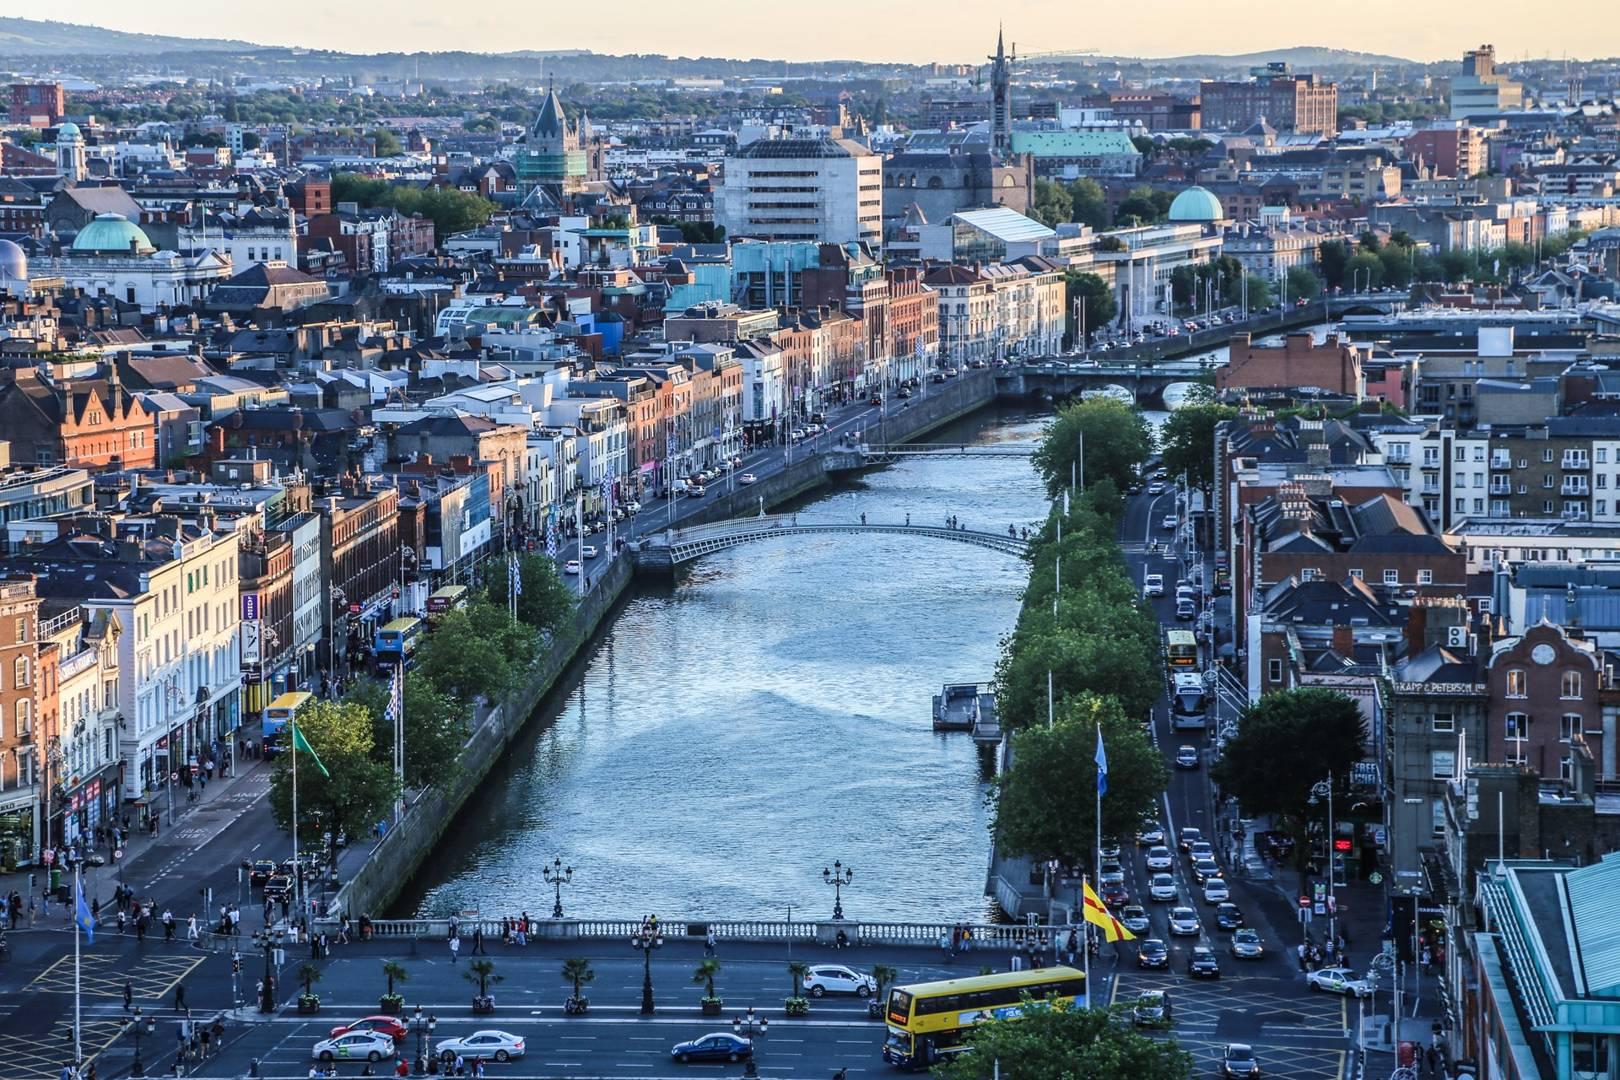 view-of-the-liffey-from-liberty-hall-dublin-ireland-conde-nast-traveller-4feb16-Tara-Morgan.jpg